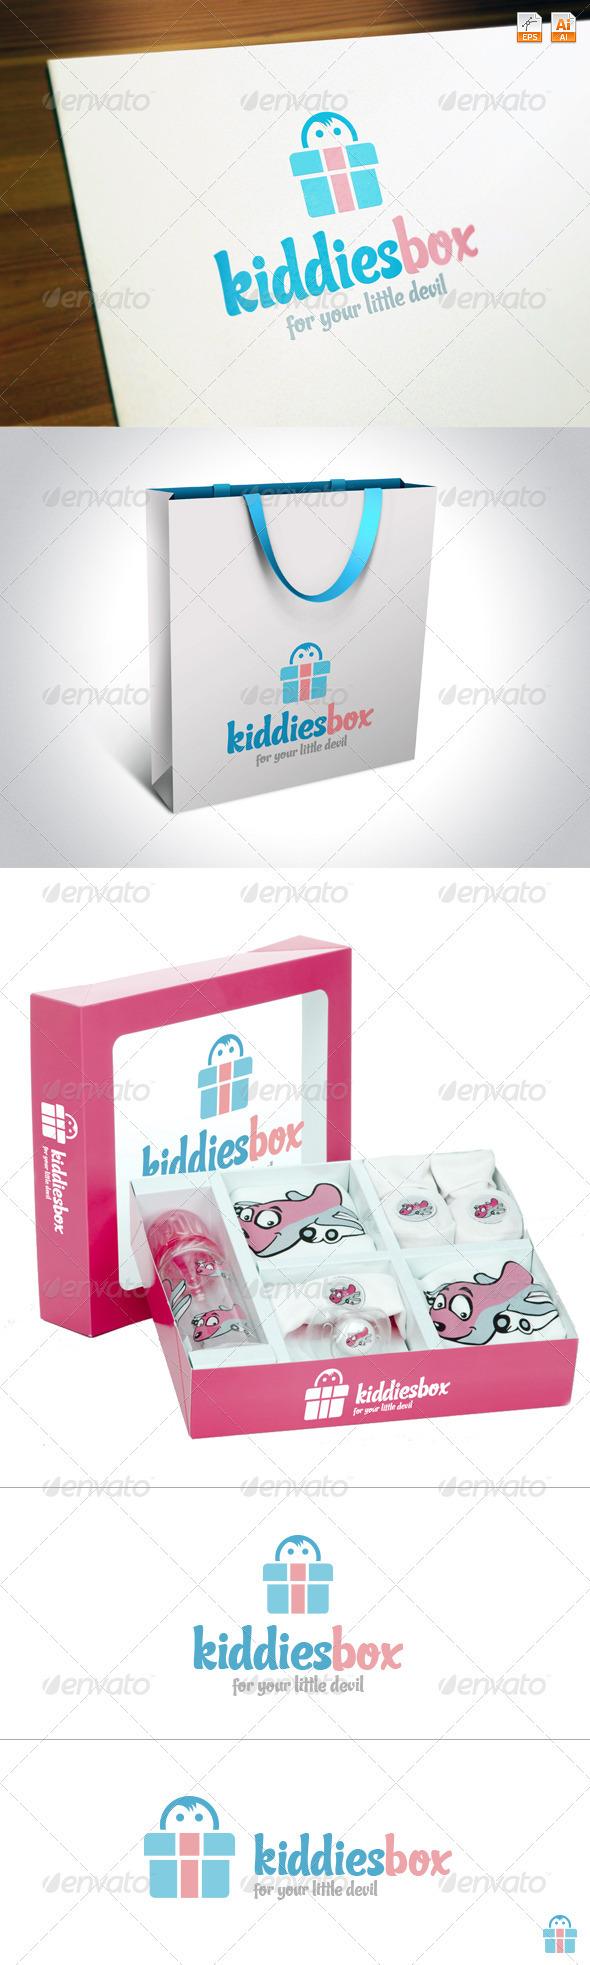 KiddiesBox - Humans Logo Templates